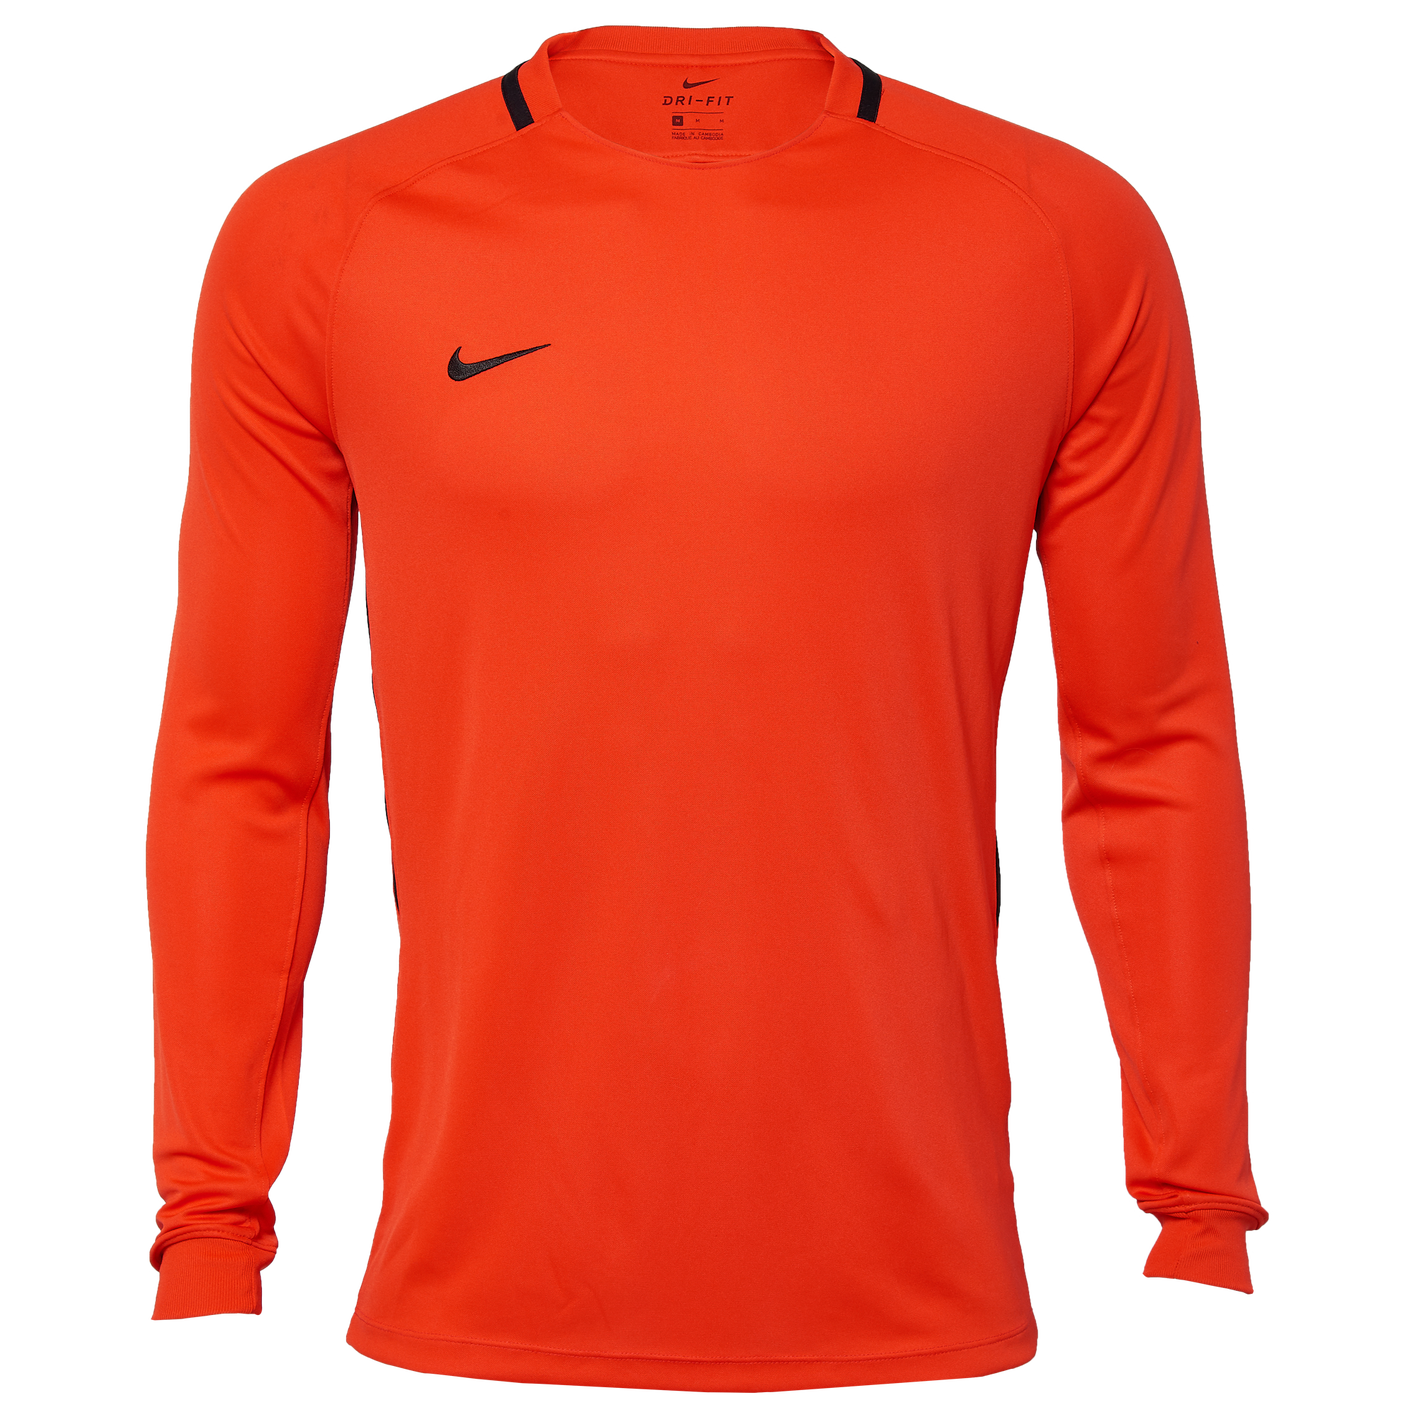 0f3fd8ed284f Nike Team L S Park Goalie III Jersey - Men s - Soccer - Clothing ...